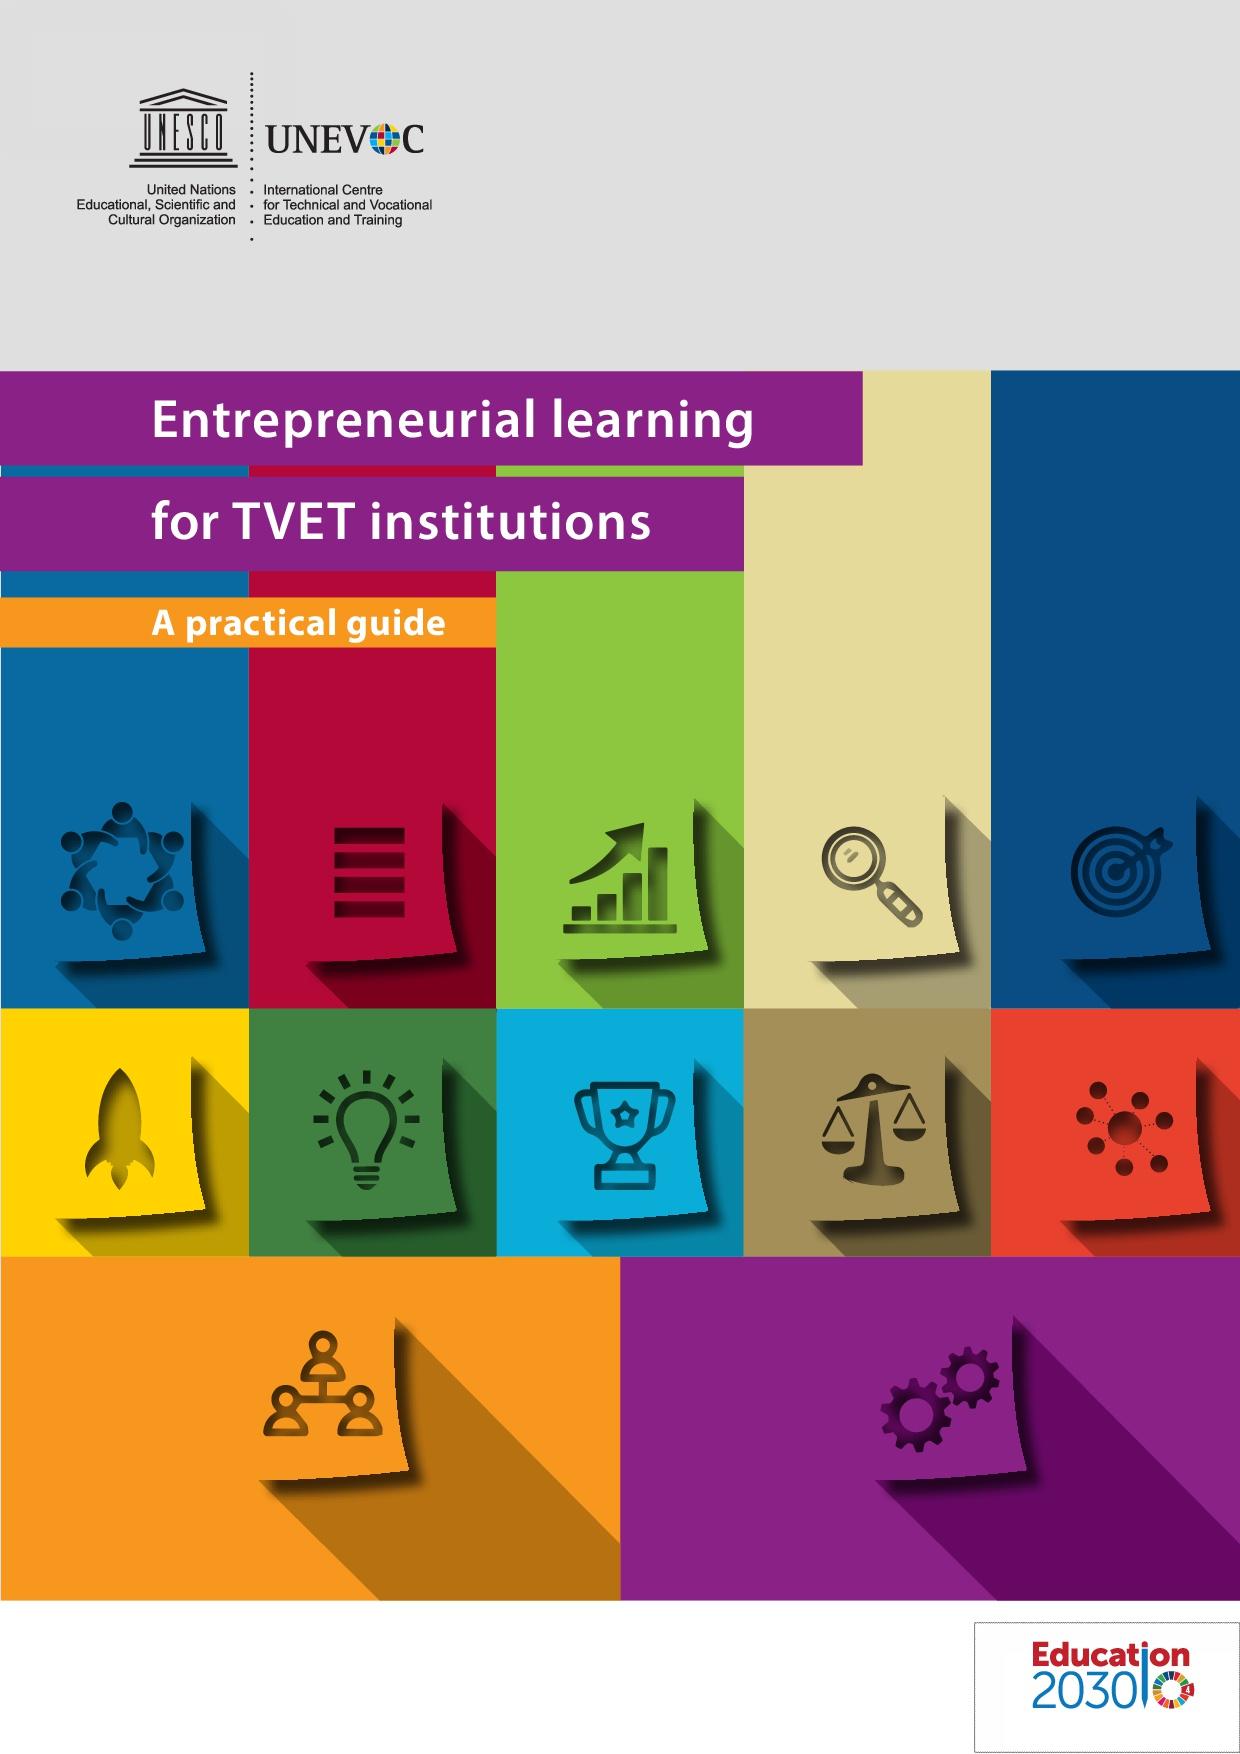 Entrepreneurial learning for VET institutions – a practical guide